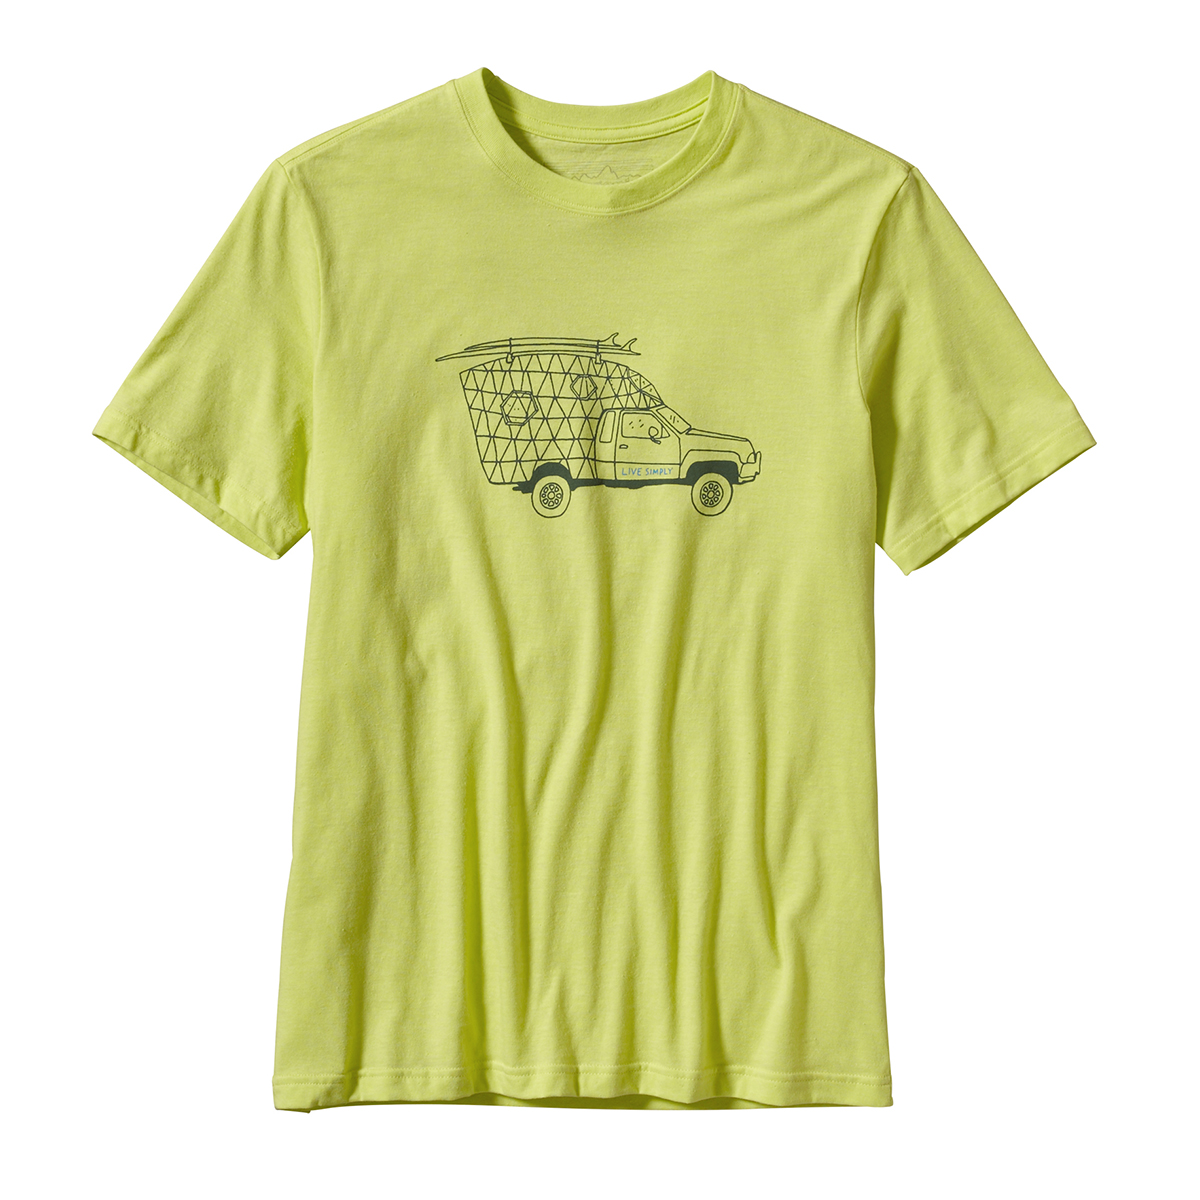 Patagonia live simply surf camper t shirts shirts for Surf shop tee shirts